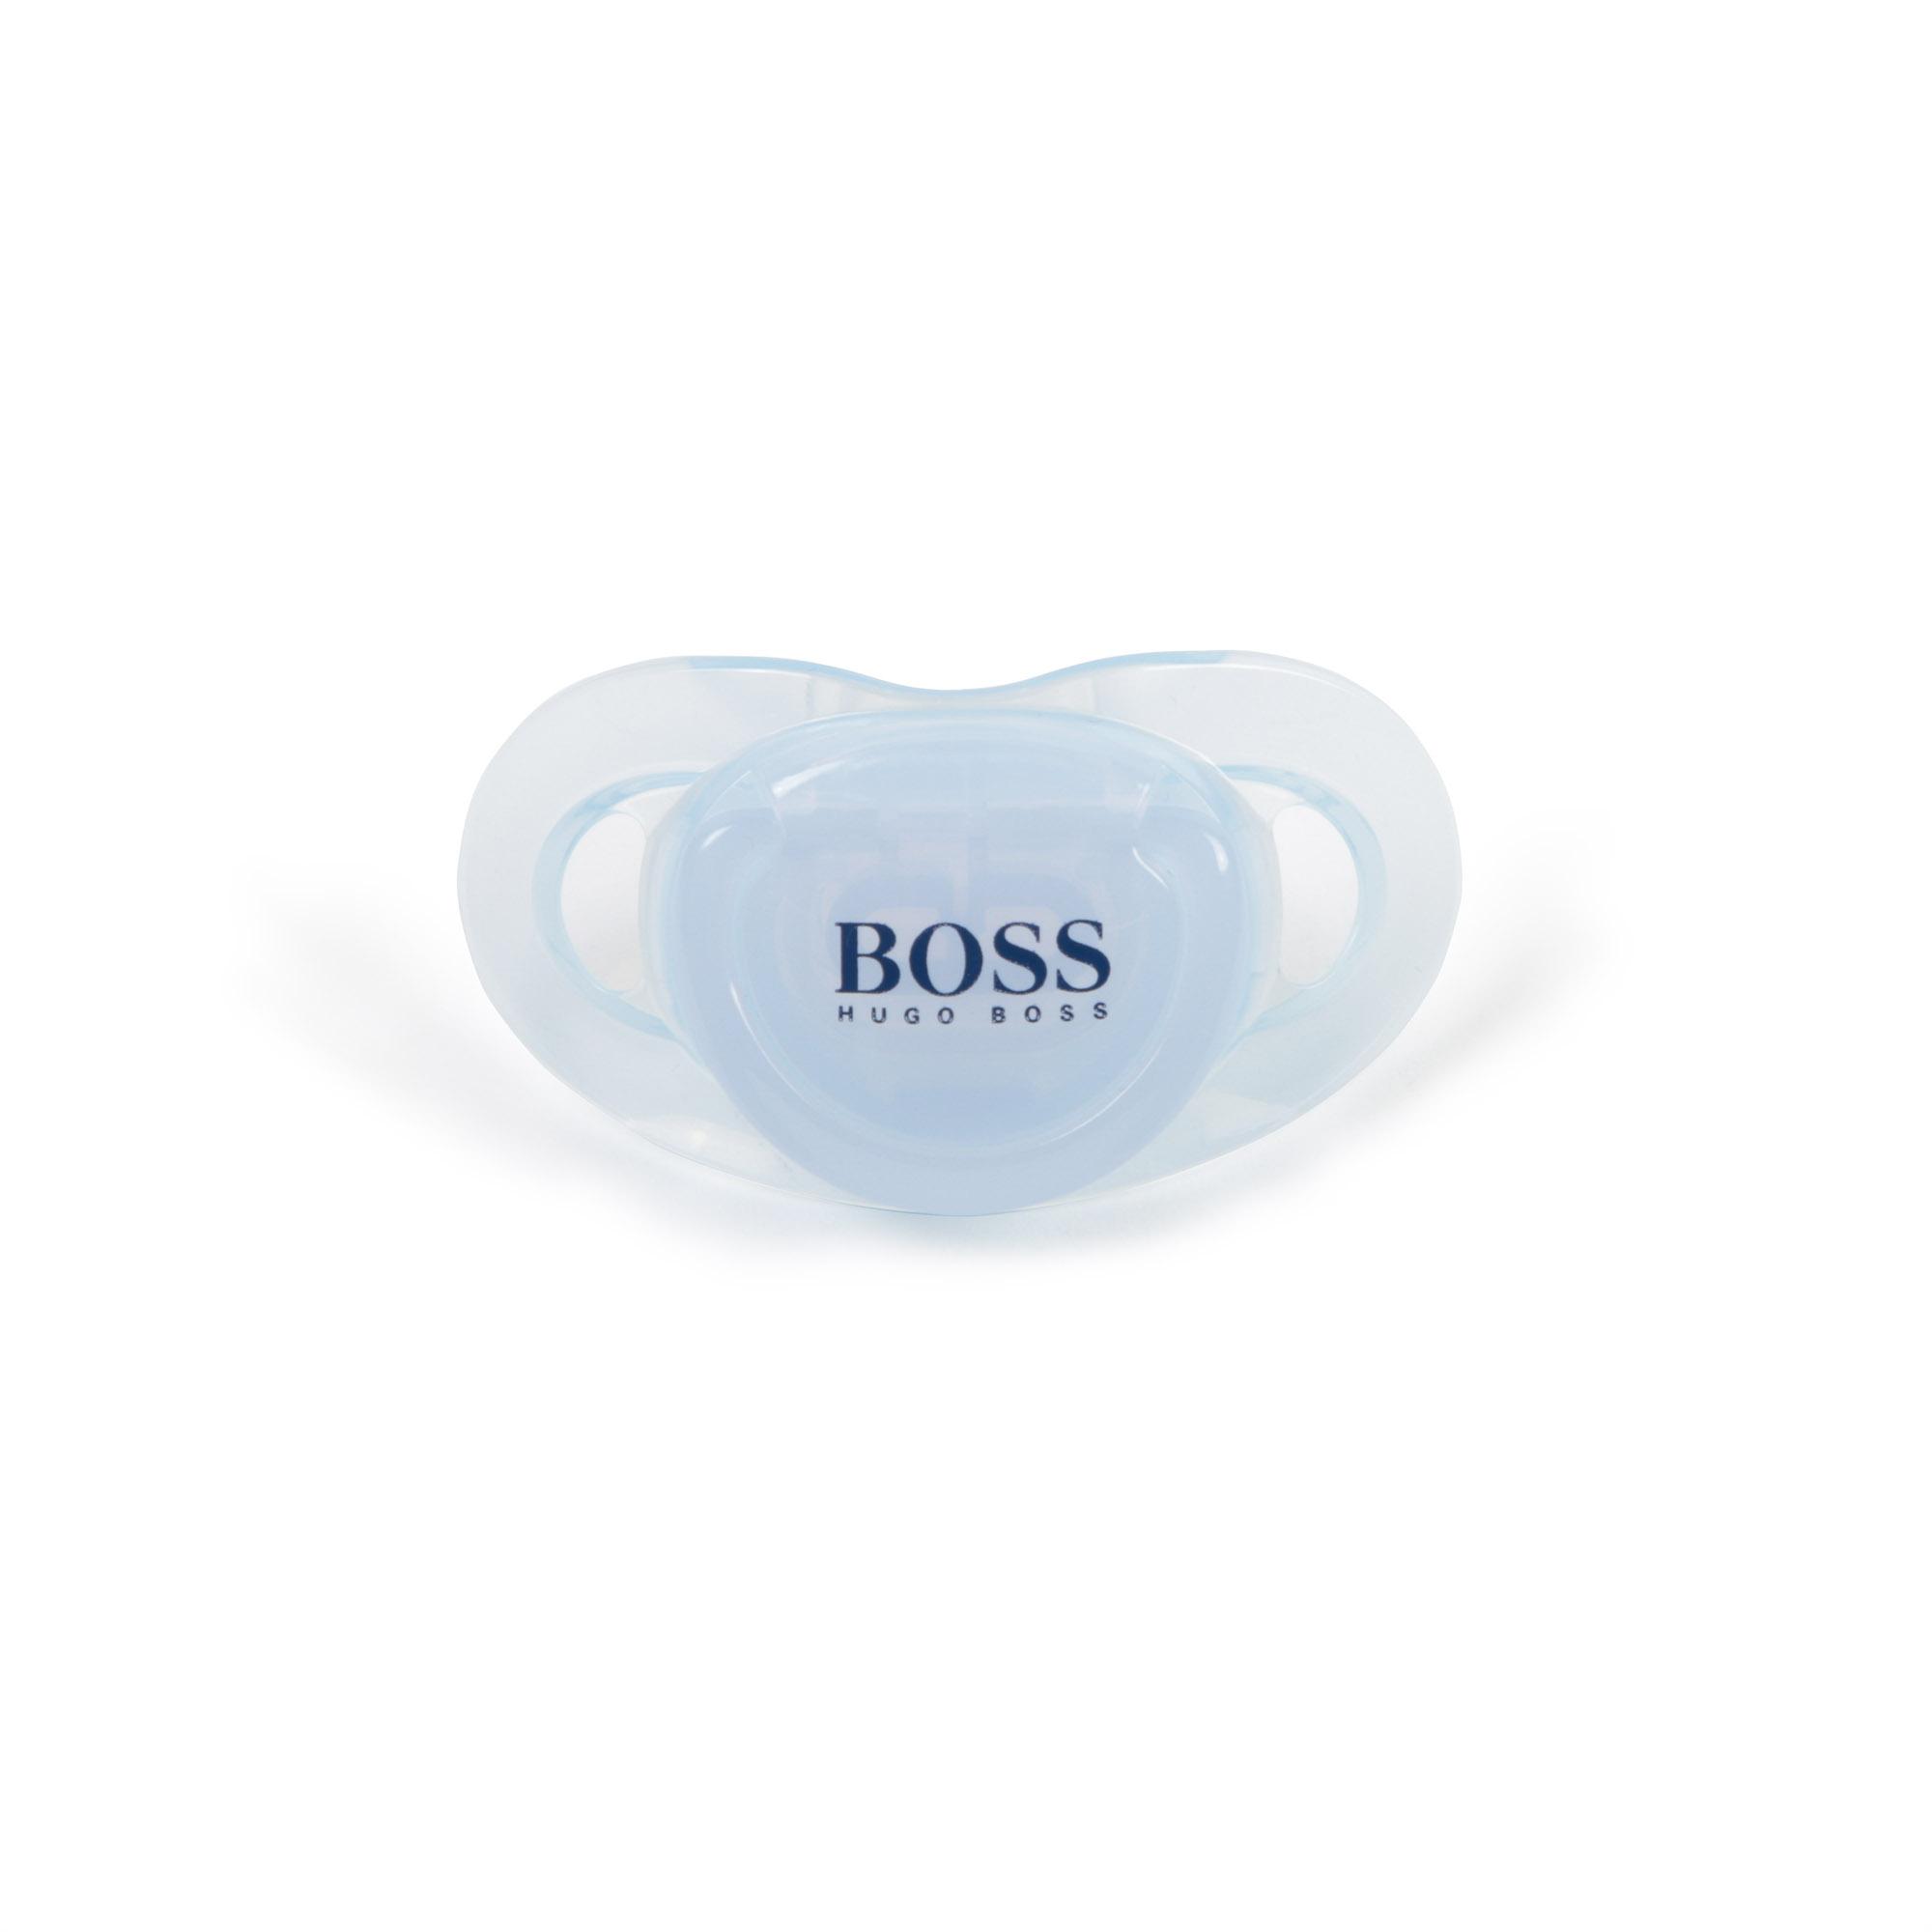 Hugo Boss baby pacifier - light blue